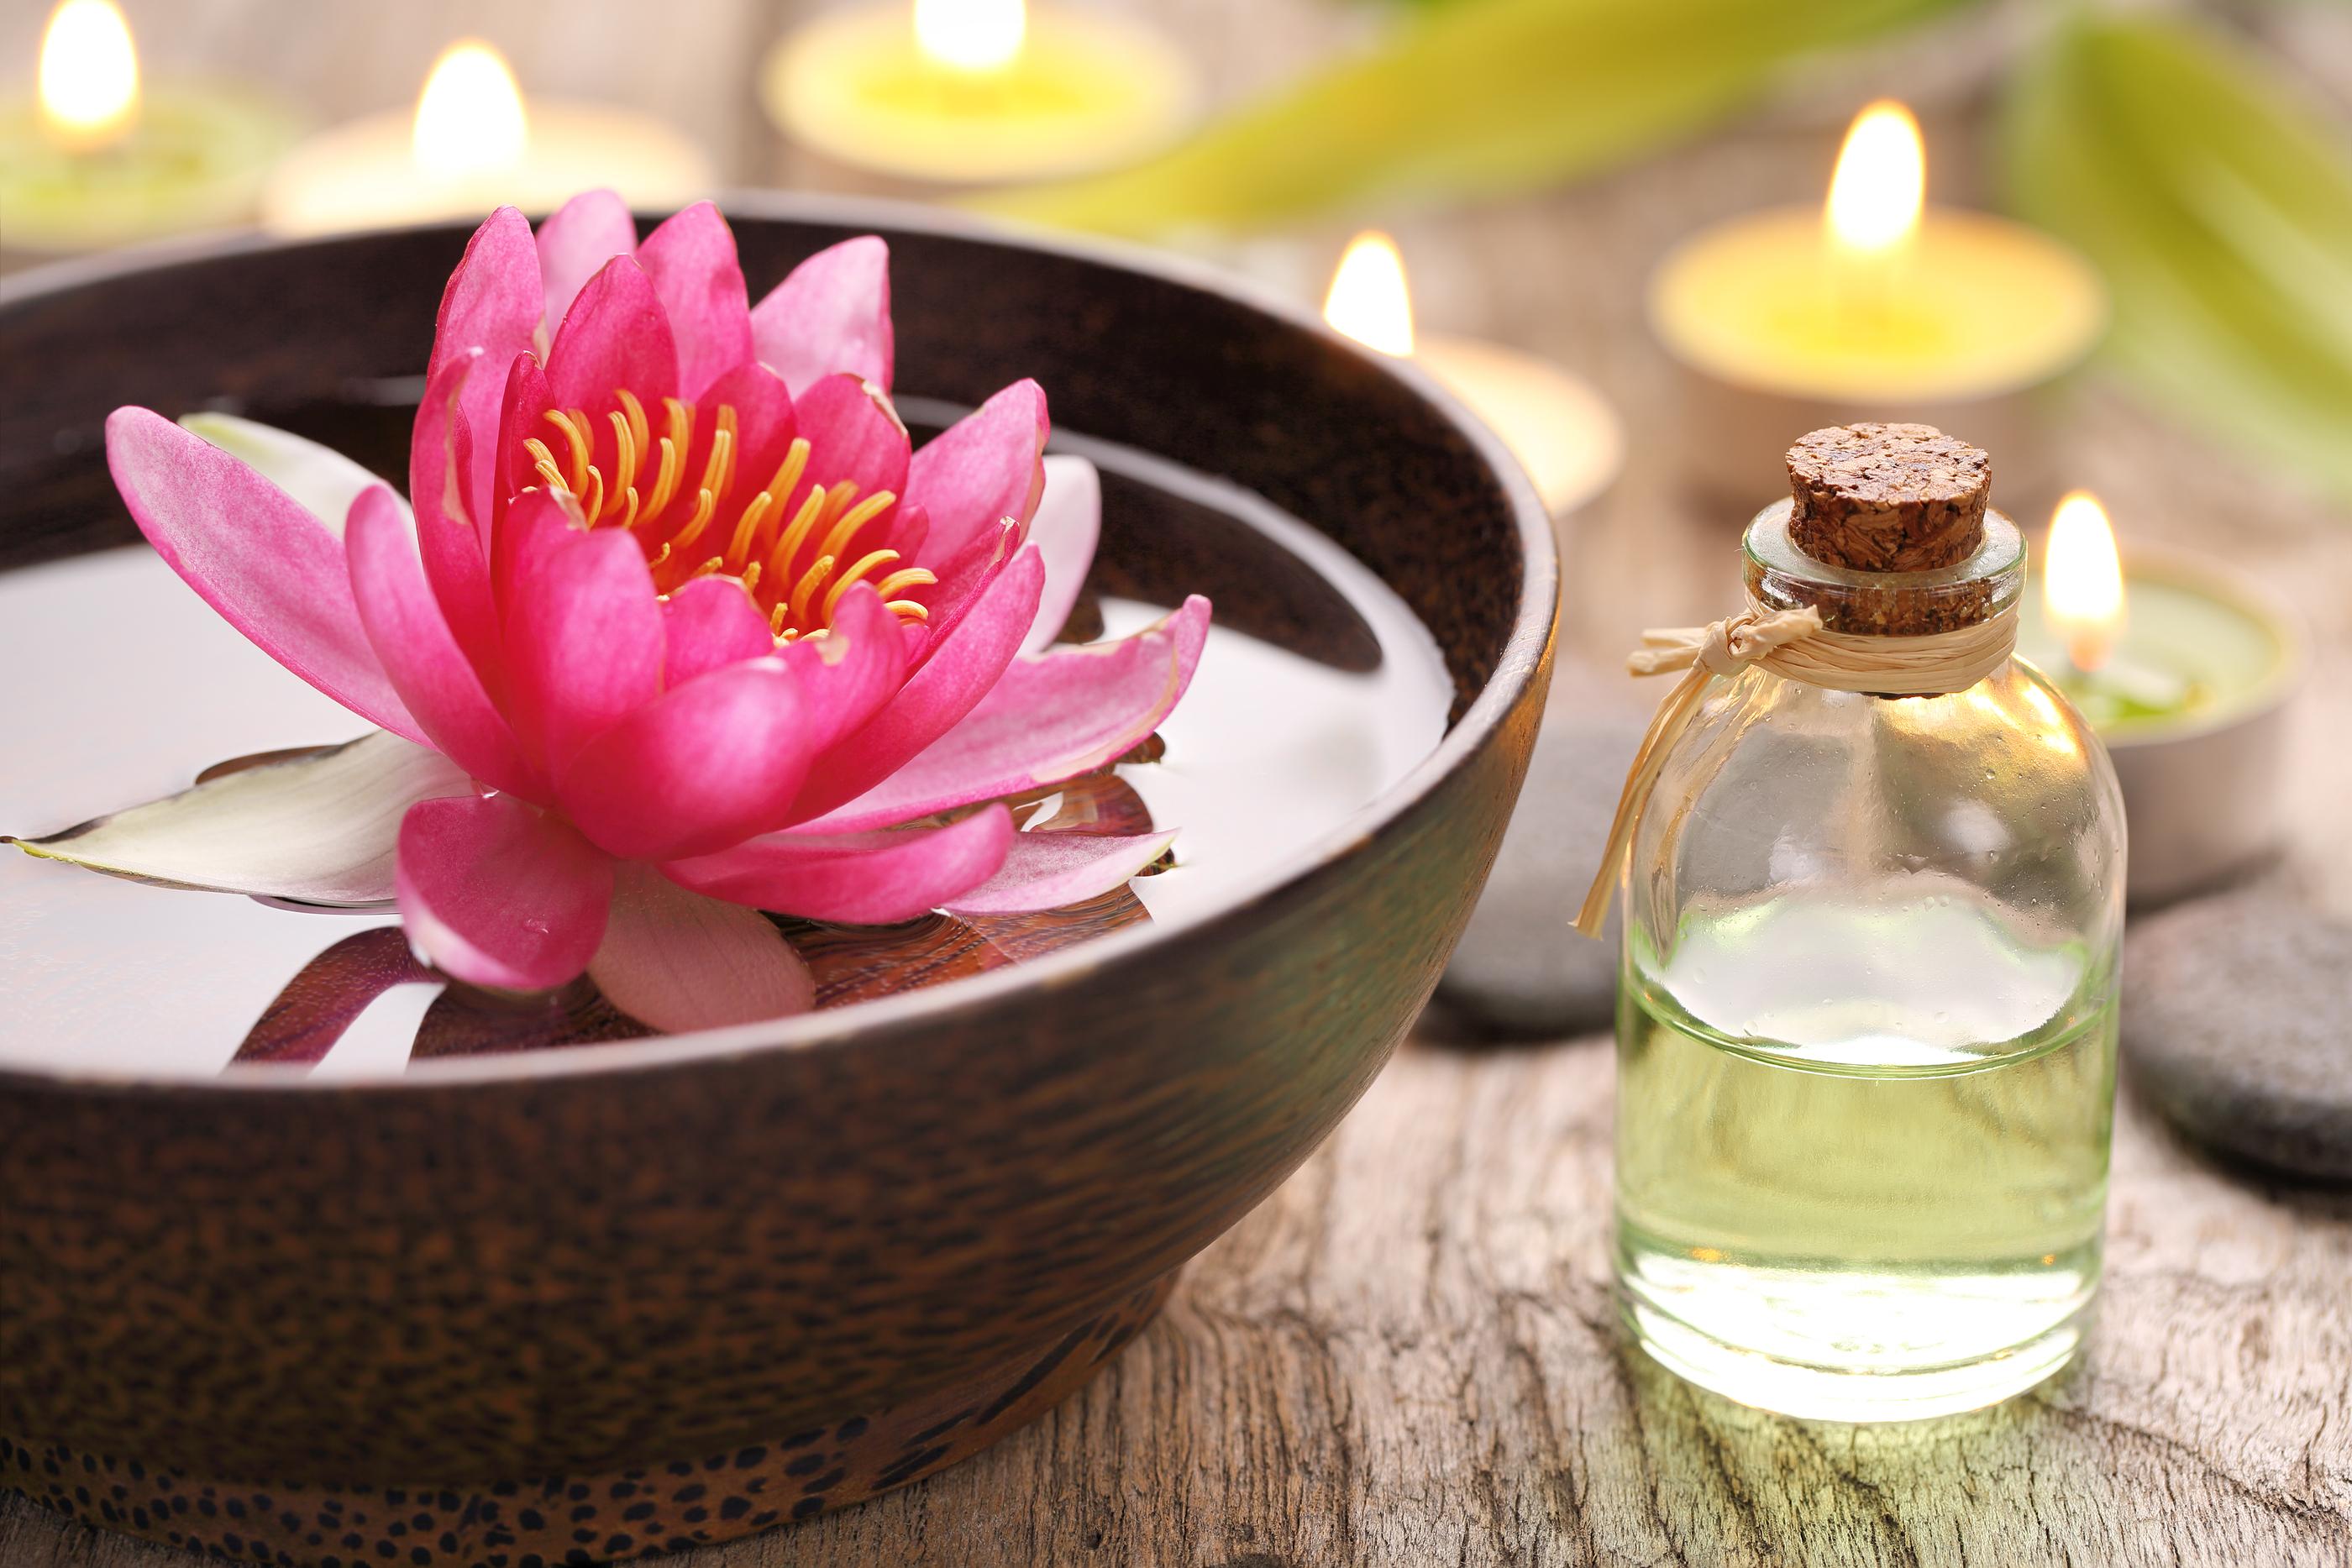 Lotus rain healing nurturing massage therapy in glendale arizona izmirmasajfo Gallery